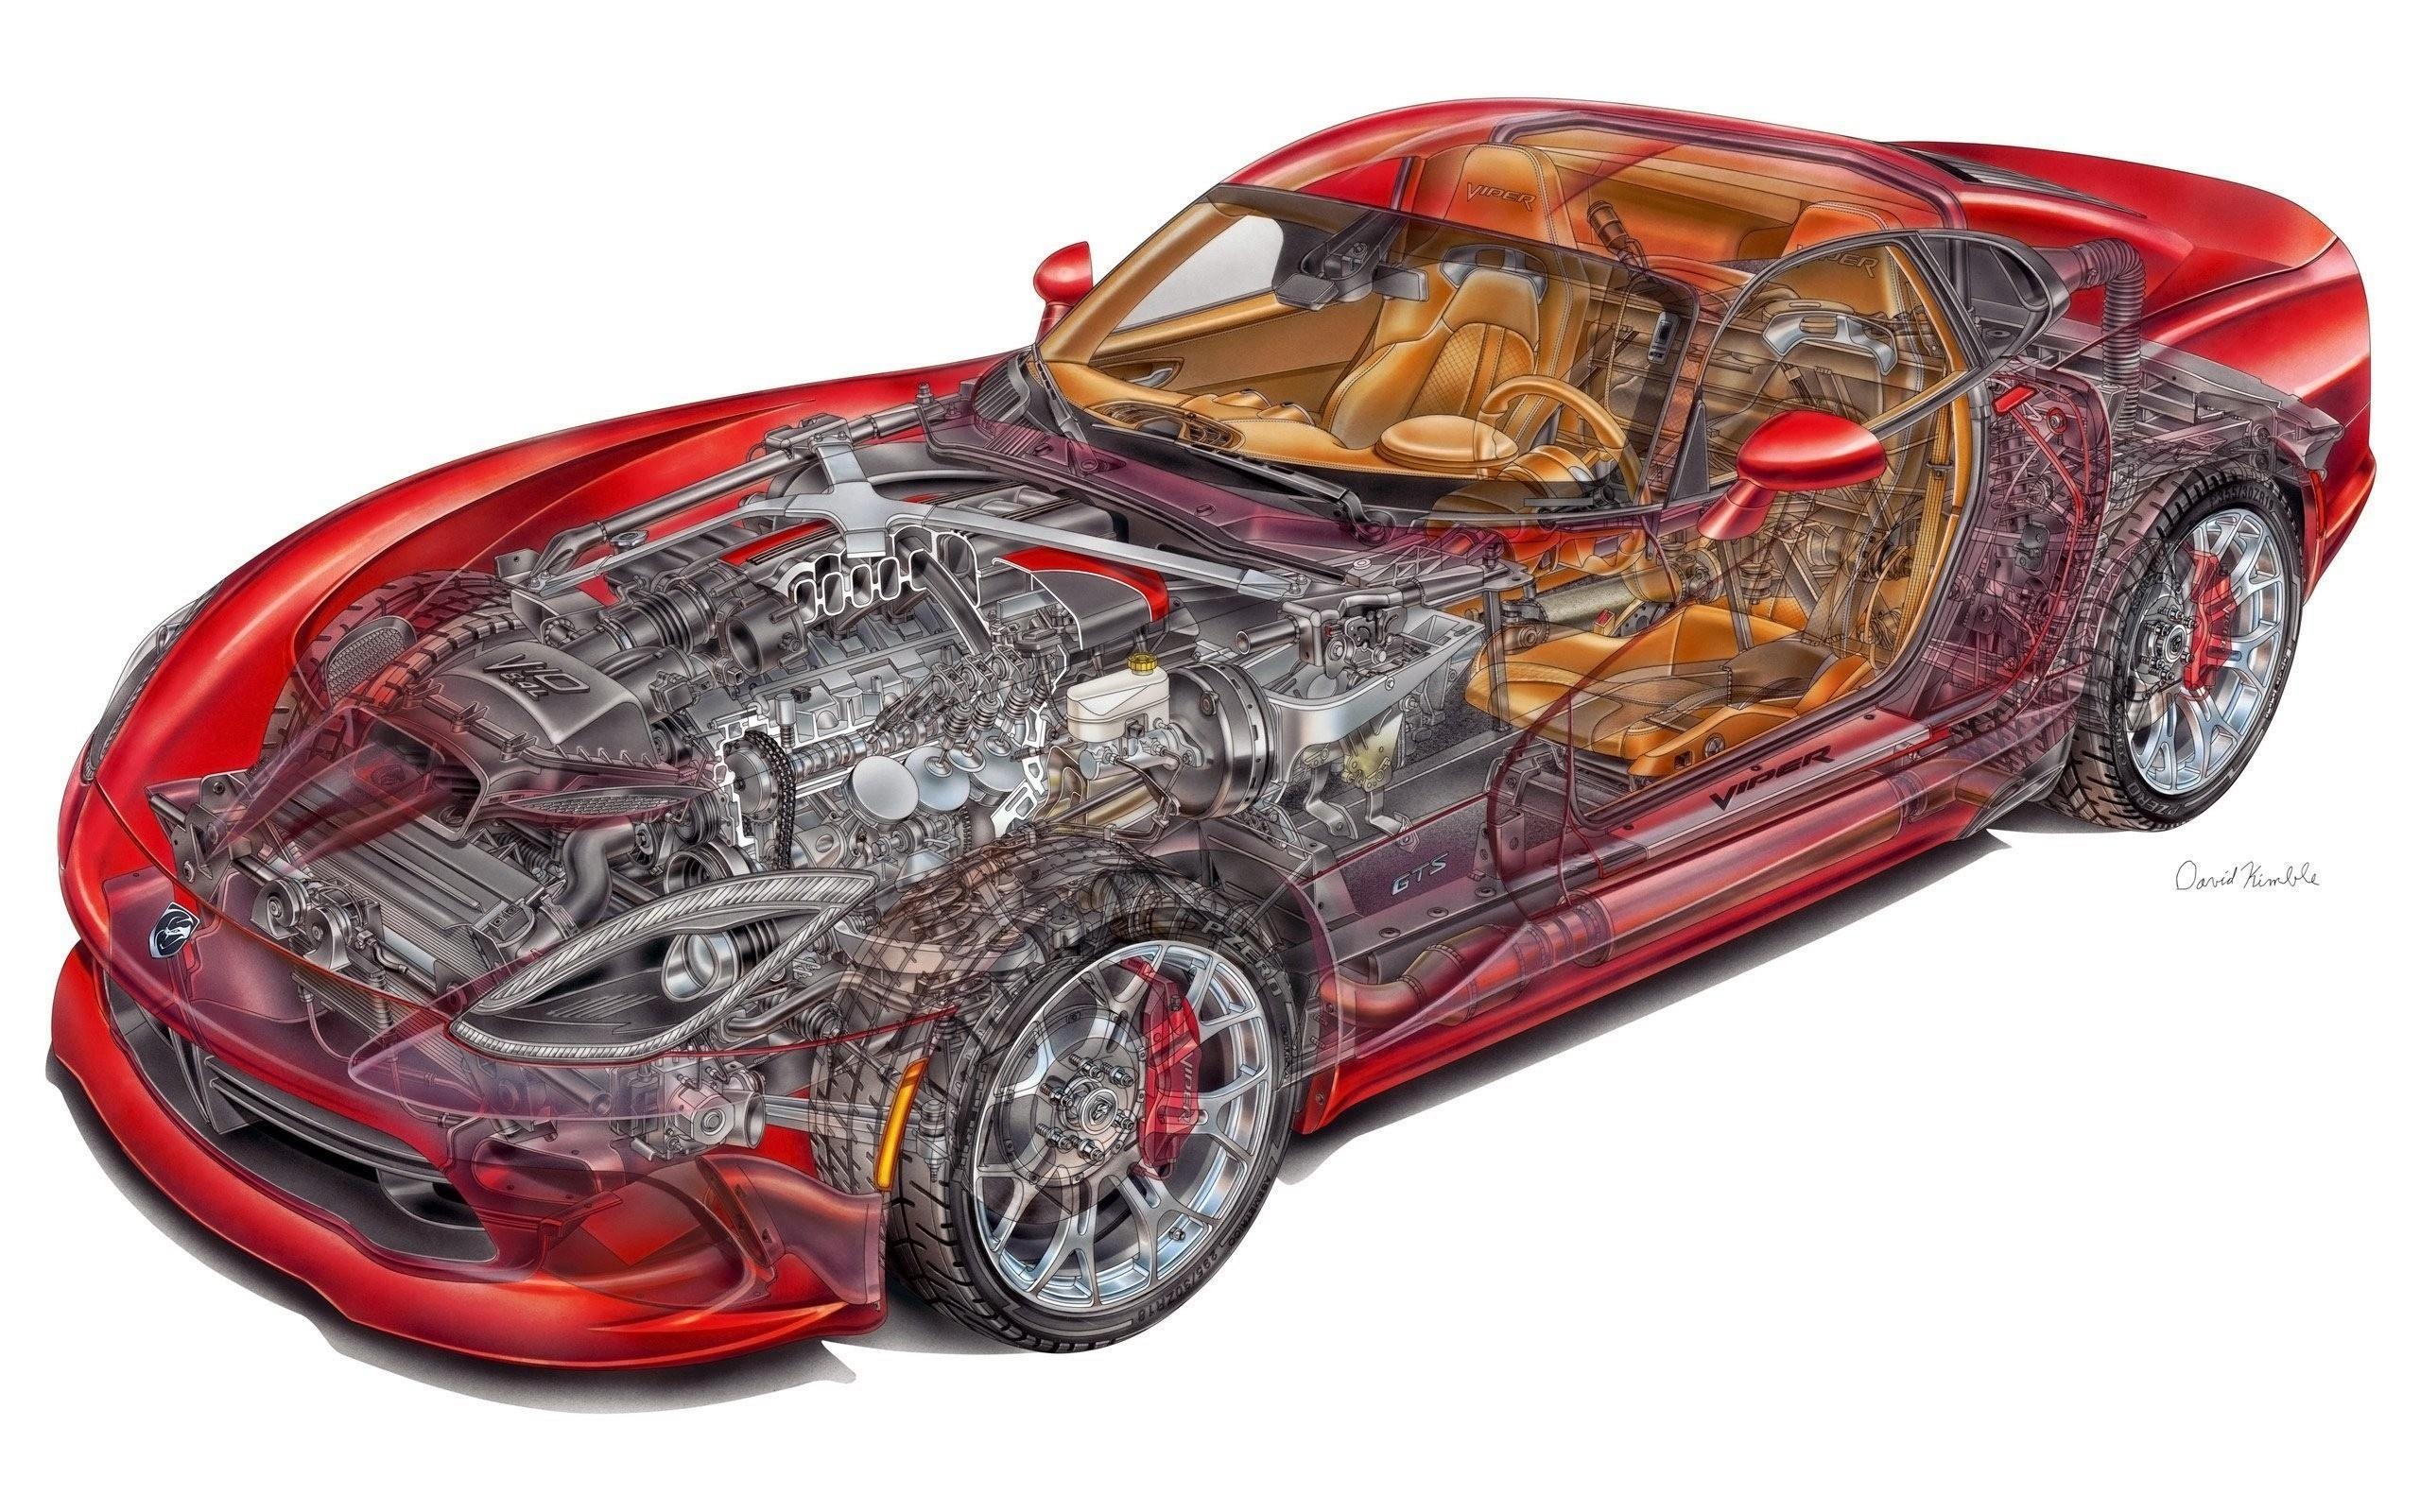 Hintergrundbilder : 2560x1600 px, Auto Innenraum, Dodge Viper ...